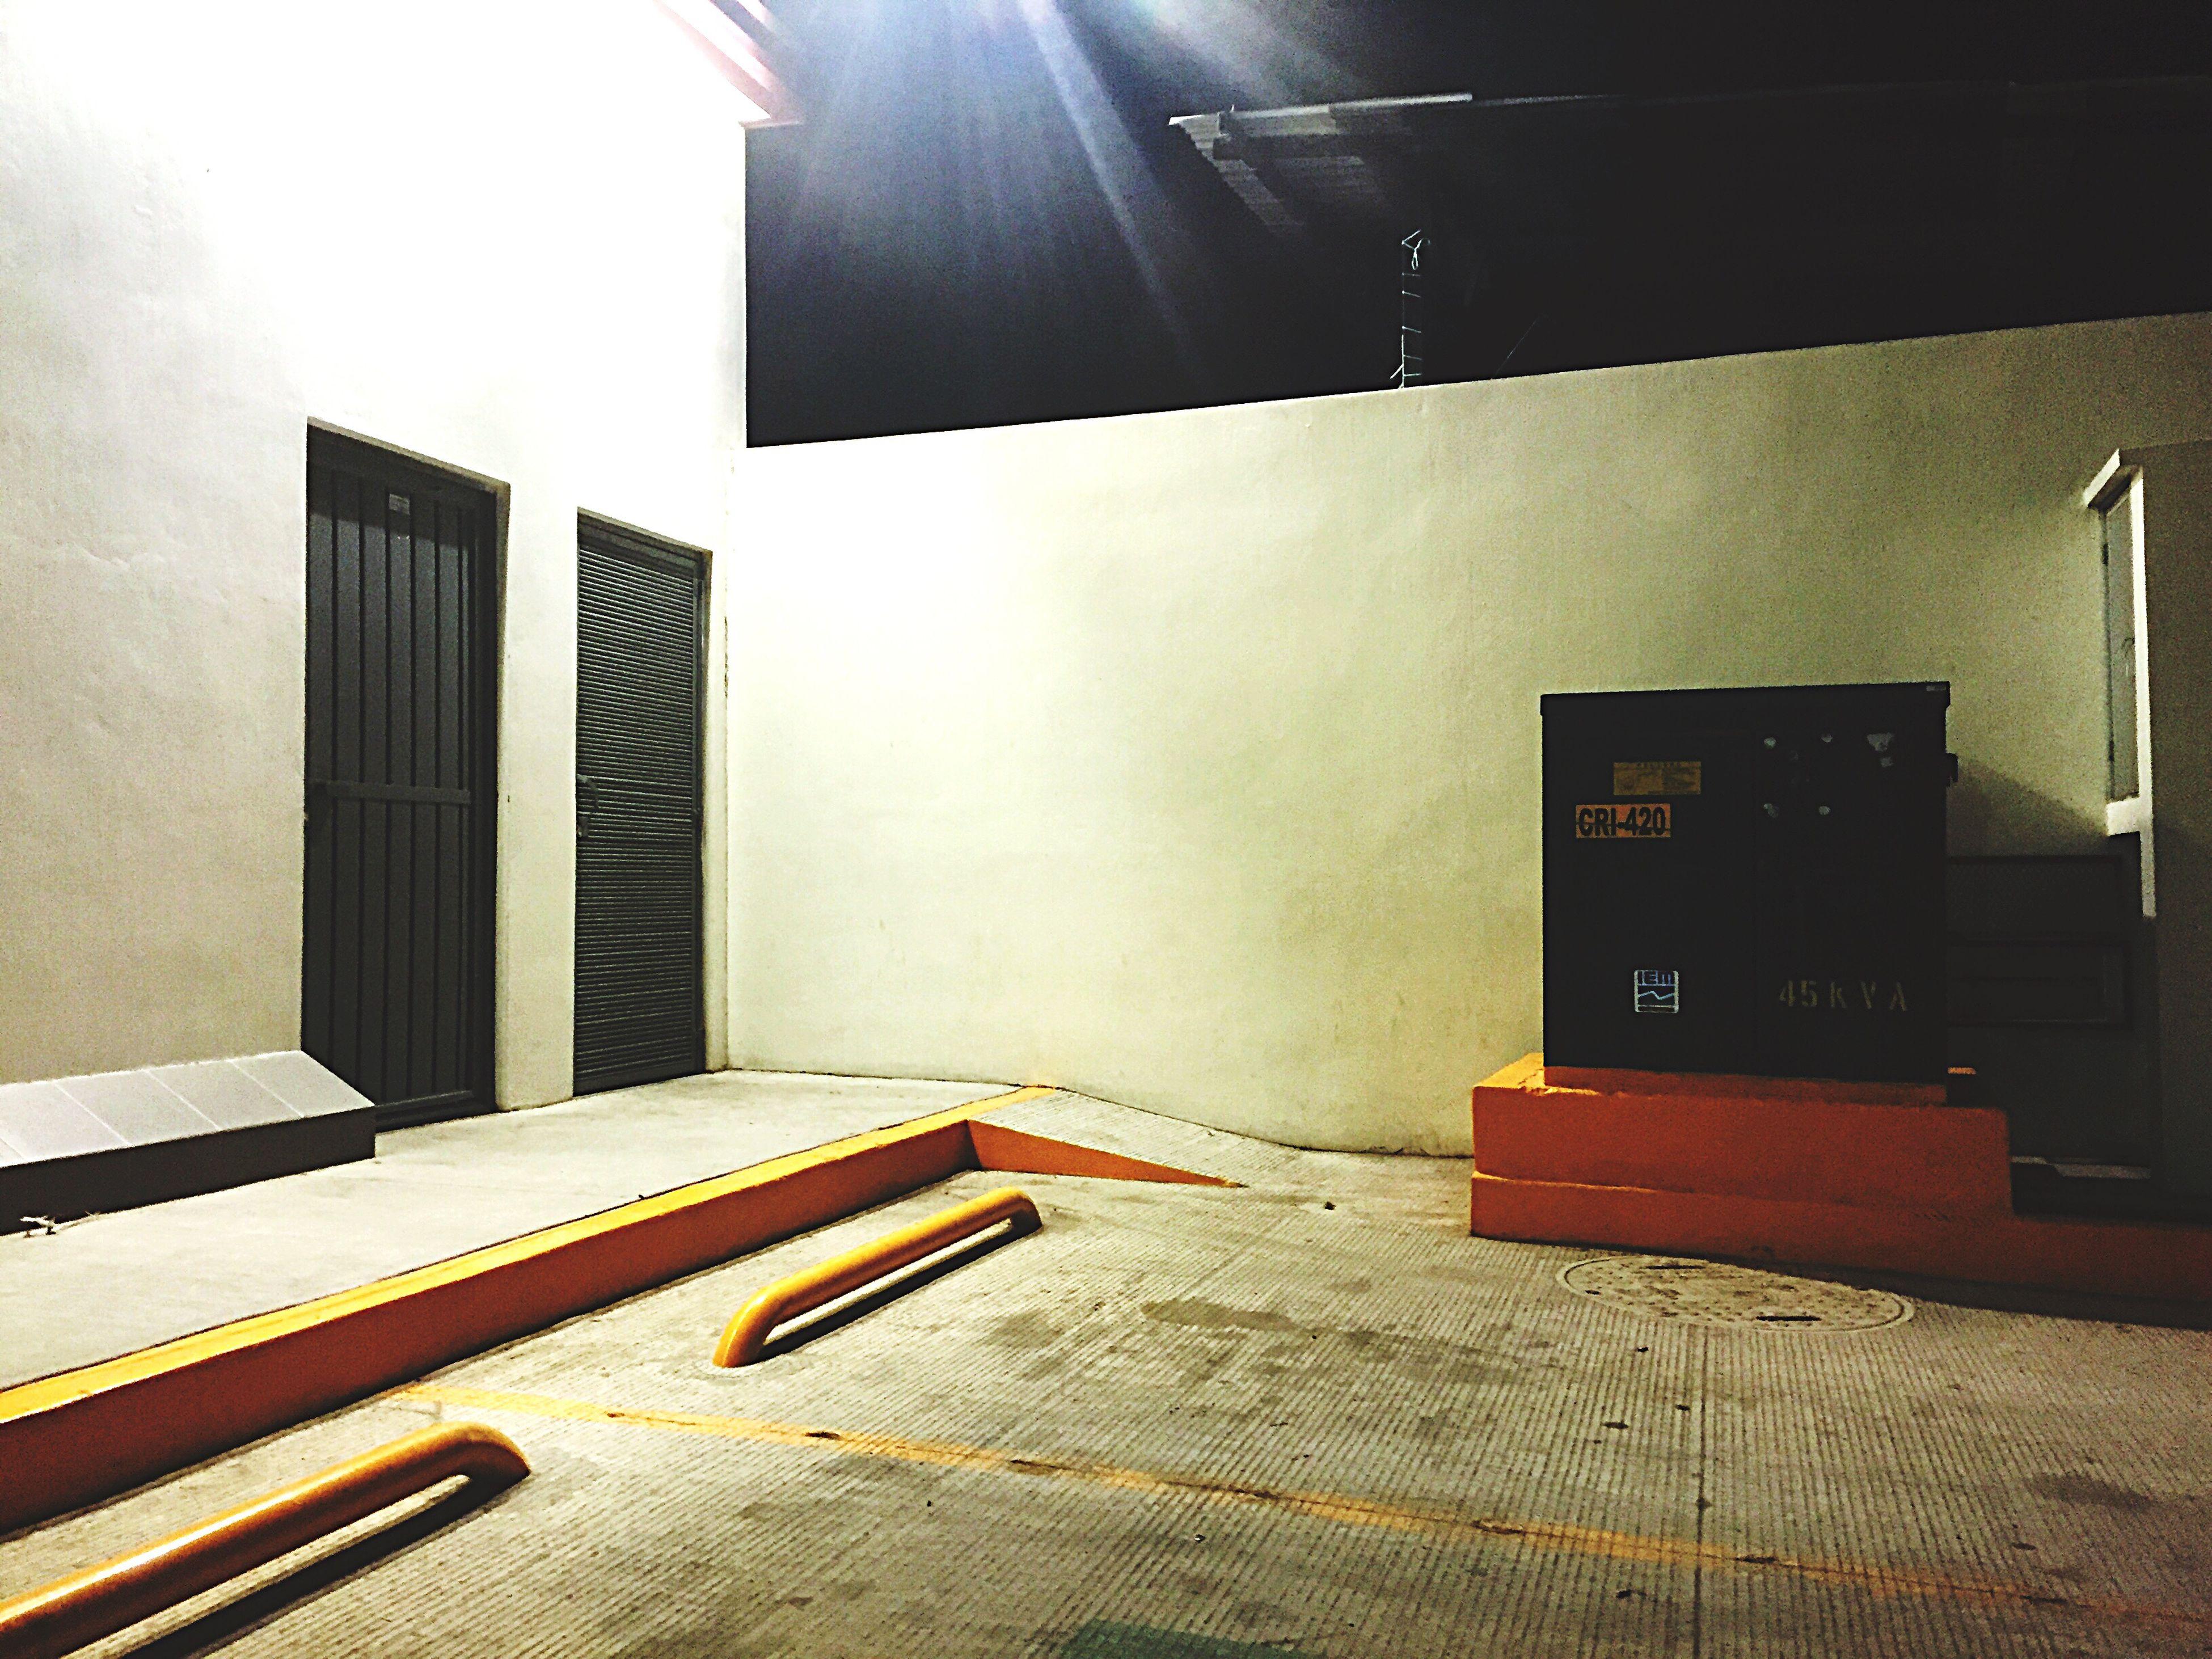 indoors, illuminated, no people, architecture, day